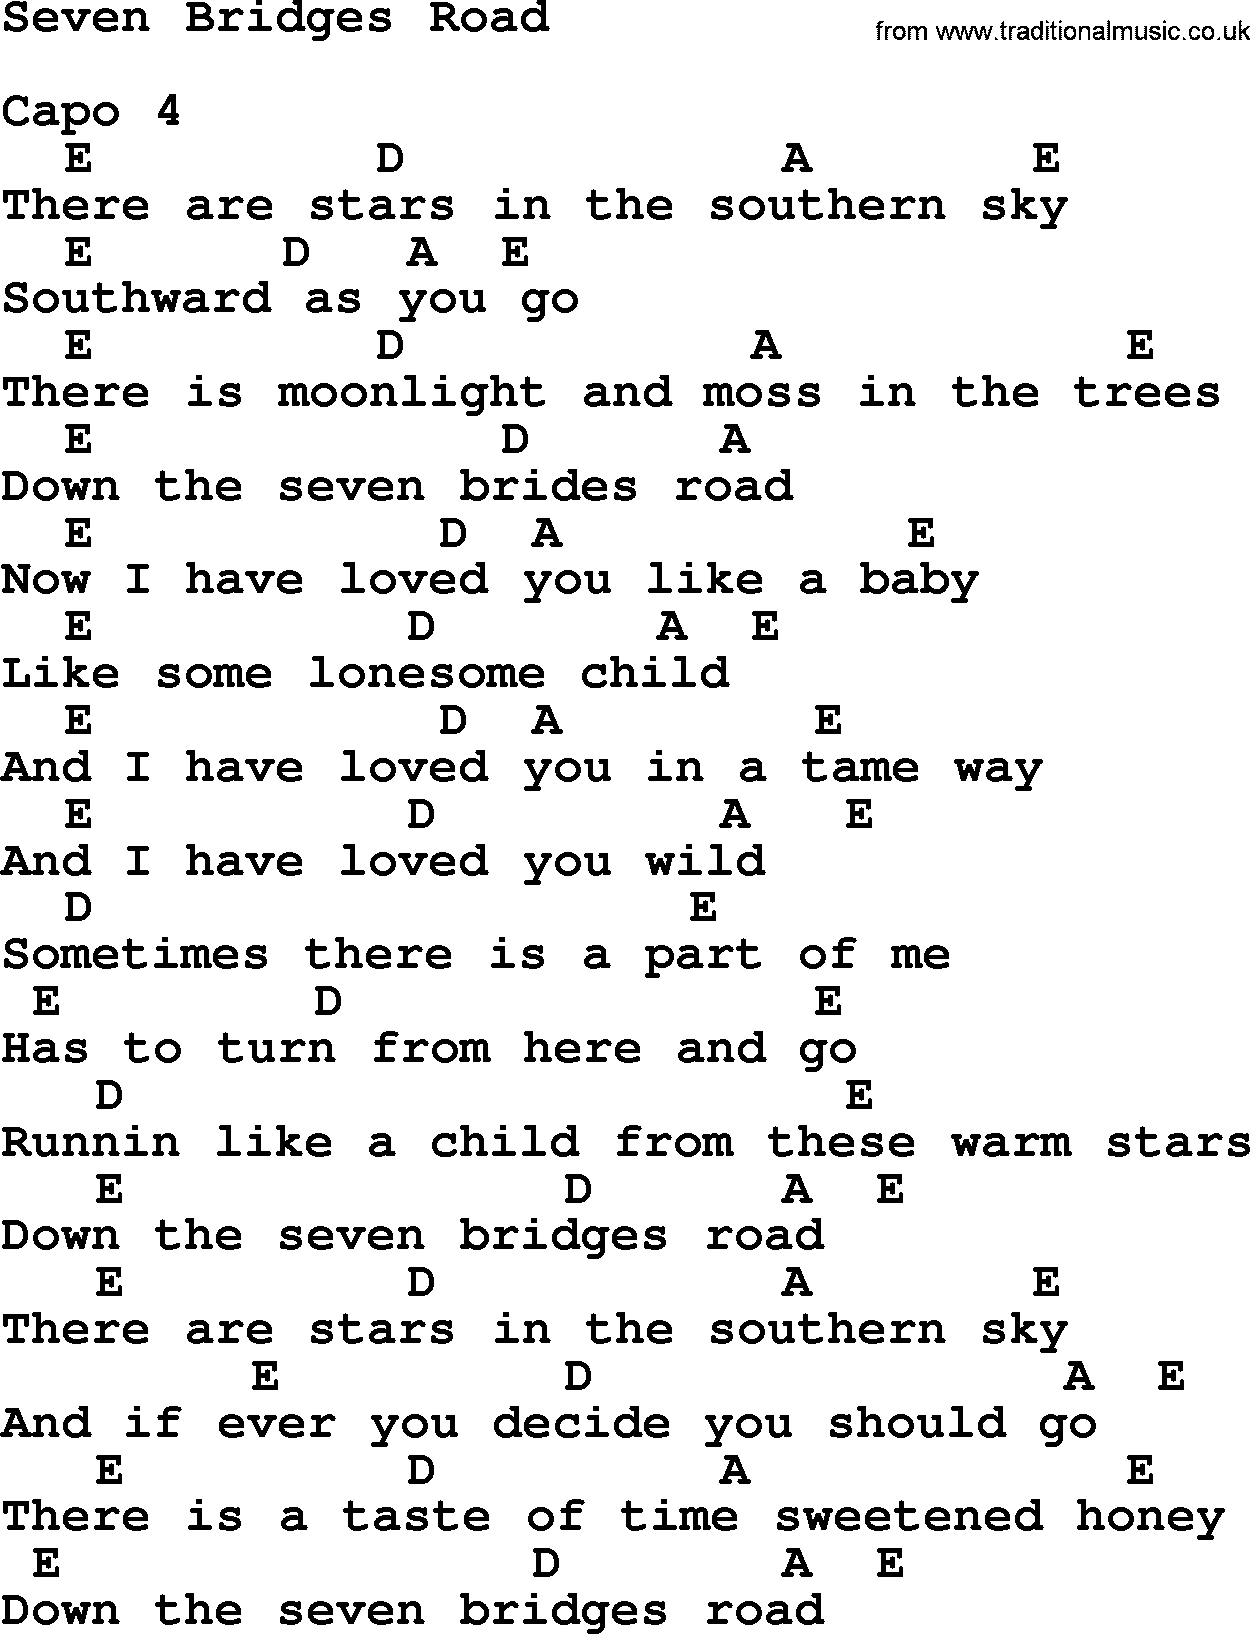 Dolly parton song seven bridges road lyrics and chords i sort of dolly parton song seven bridges road lyrics and chords i sort of want to blow hexwebz Choice Image